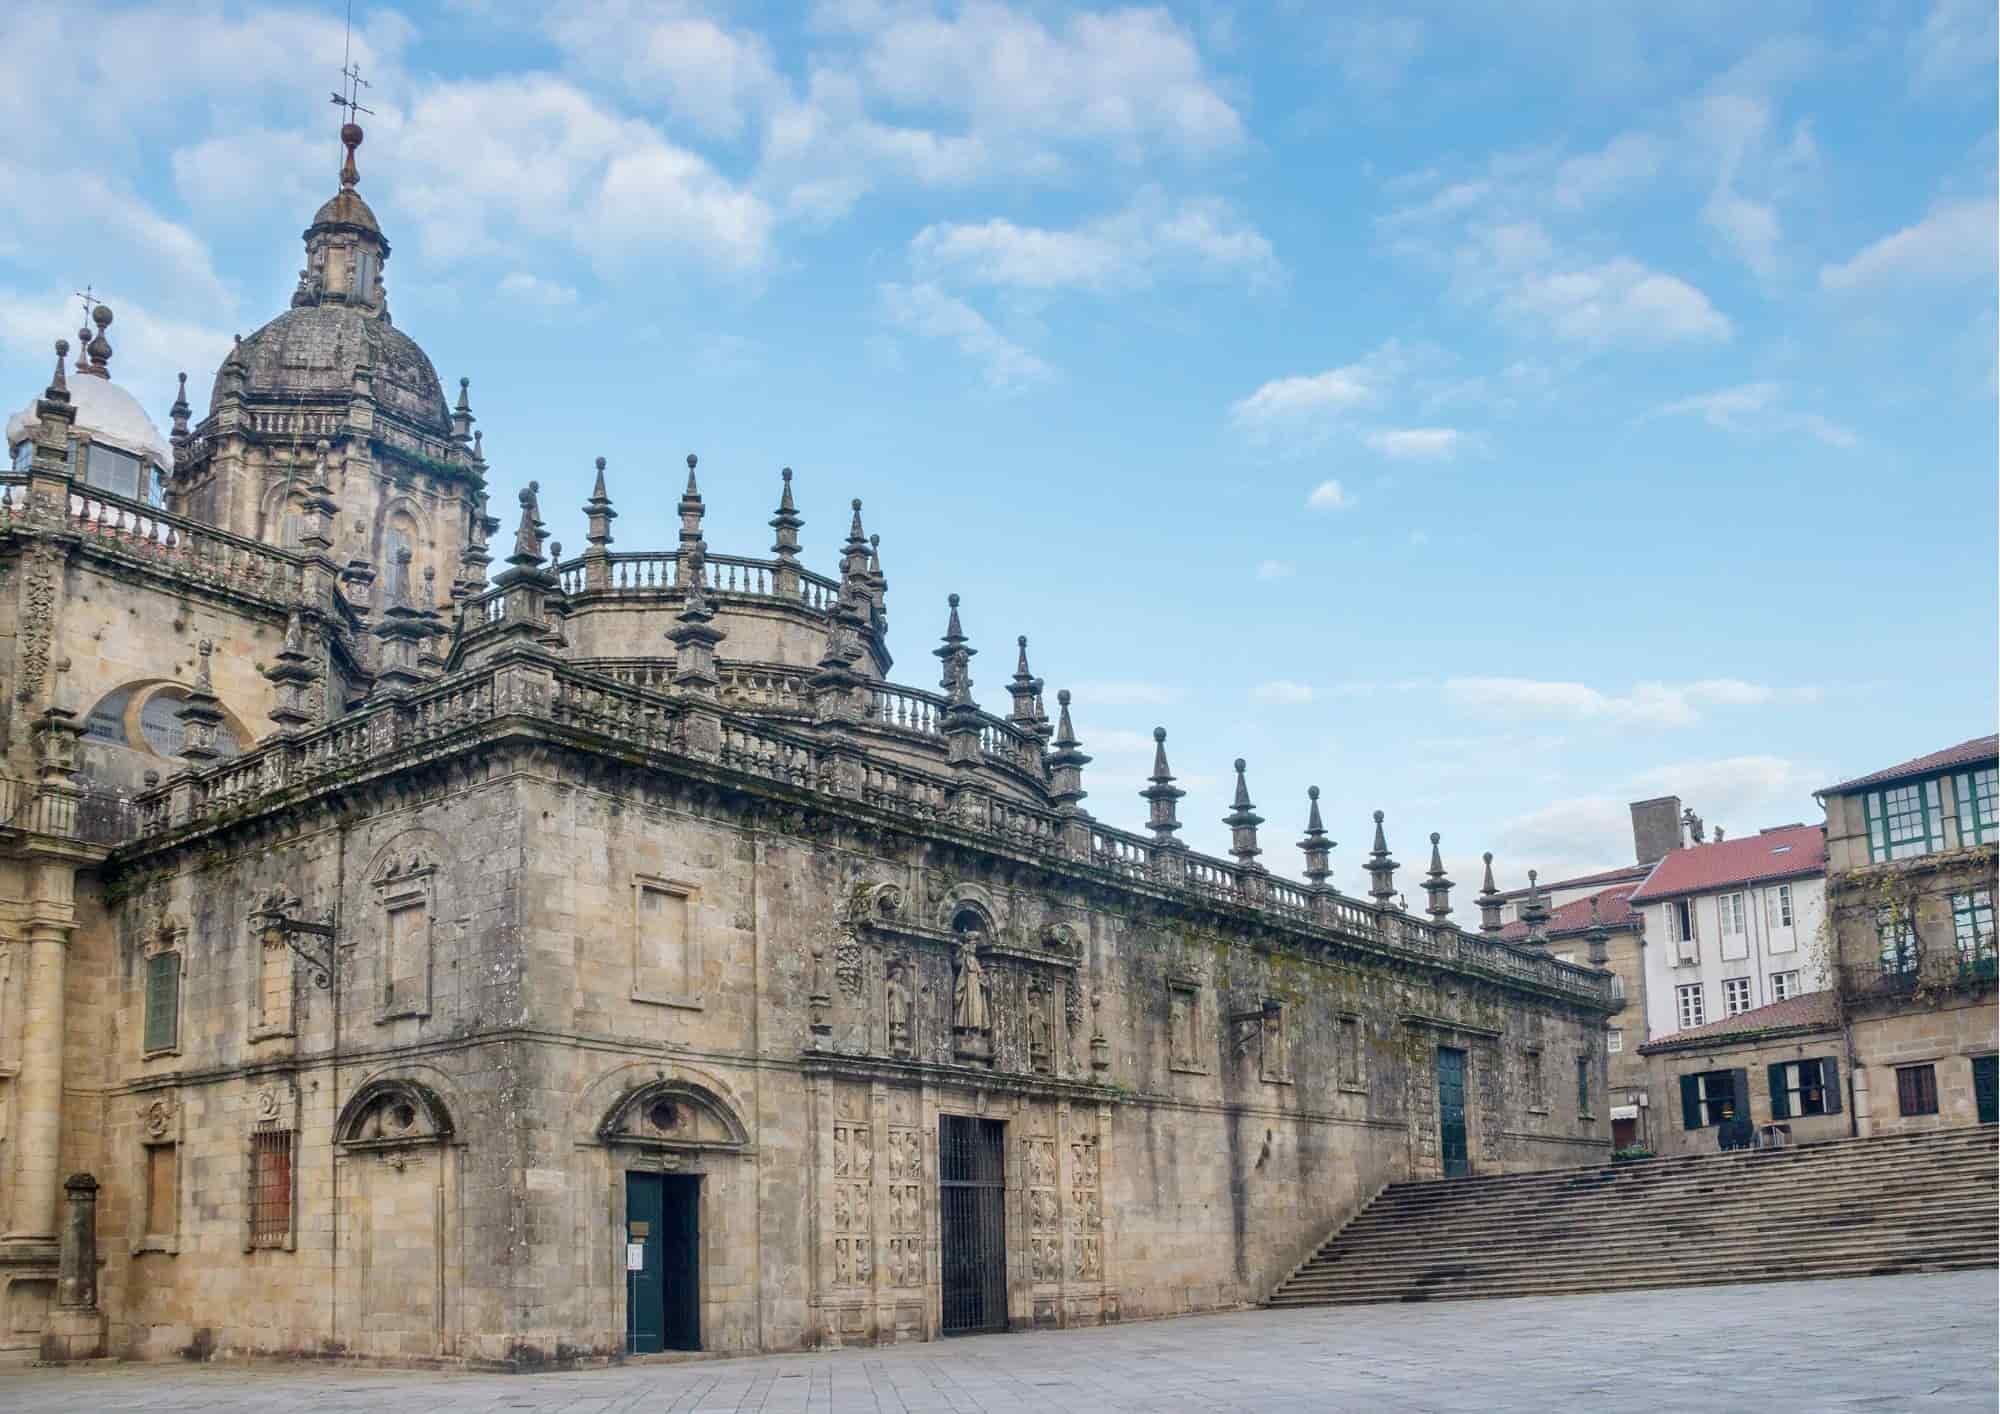 Puerta santa catedral de santiago